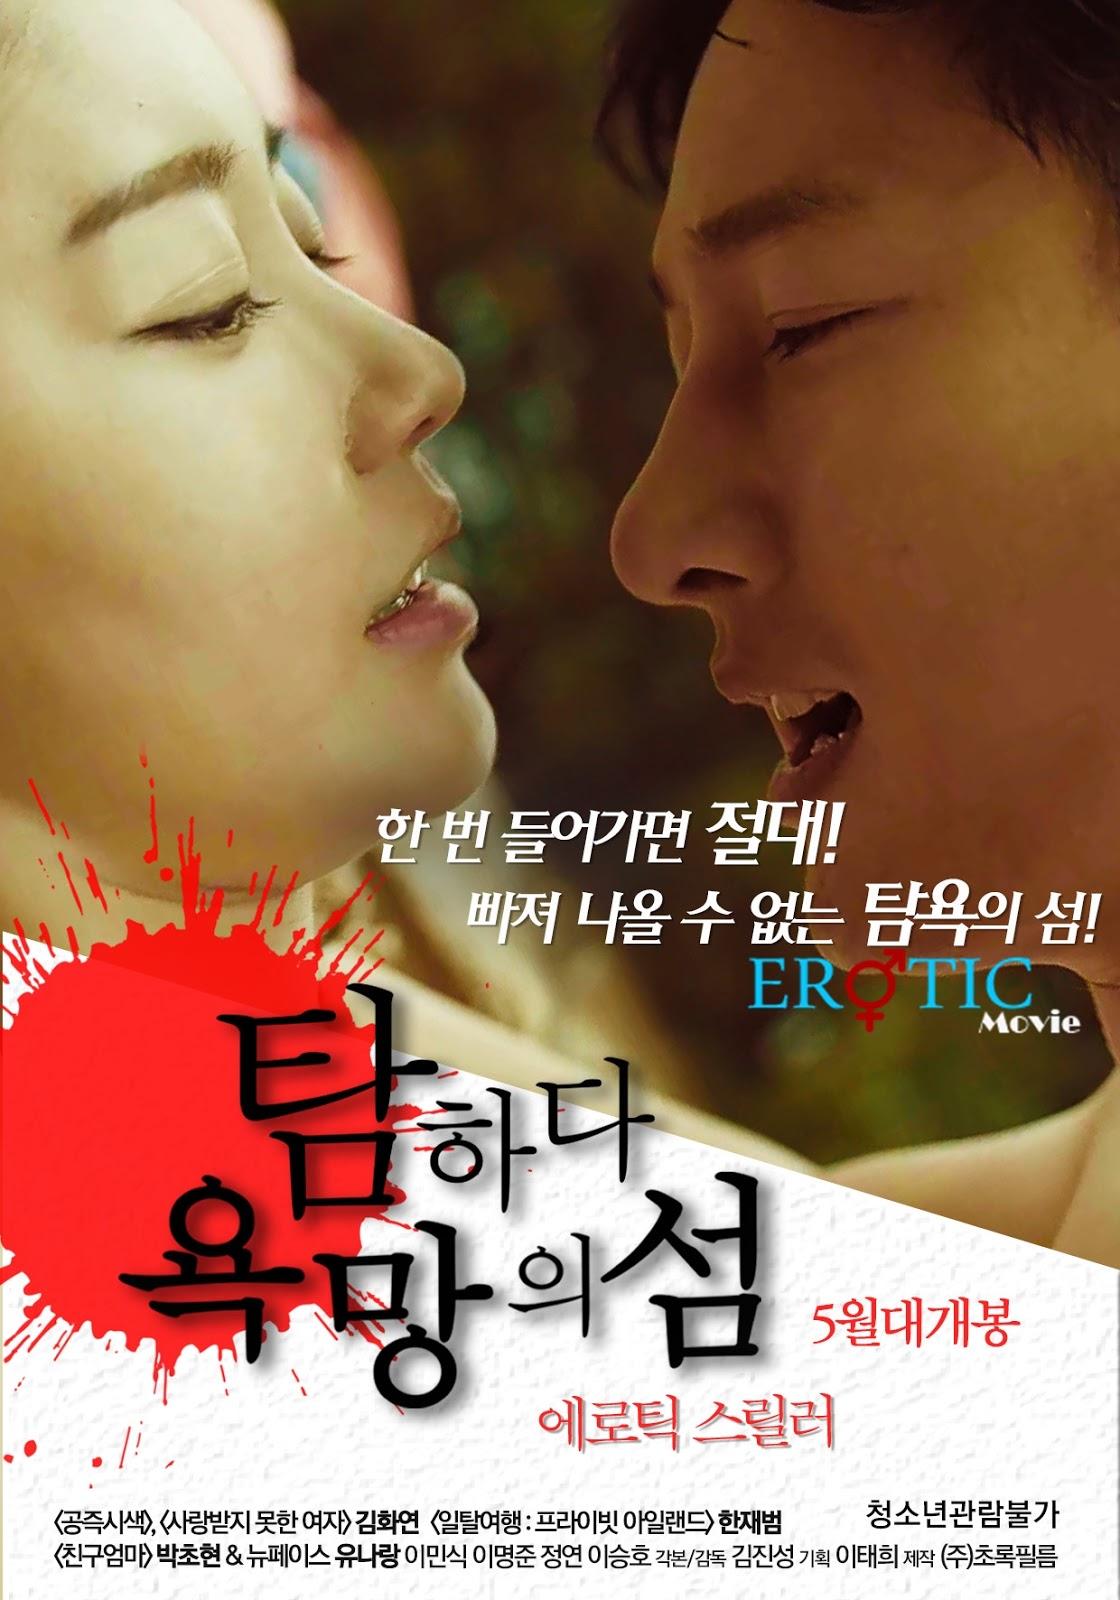 Covet Island of Desire (2017) 탐하다:욕망의 섬 [korea 18+]